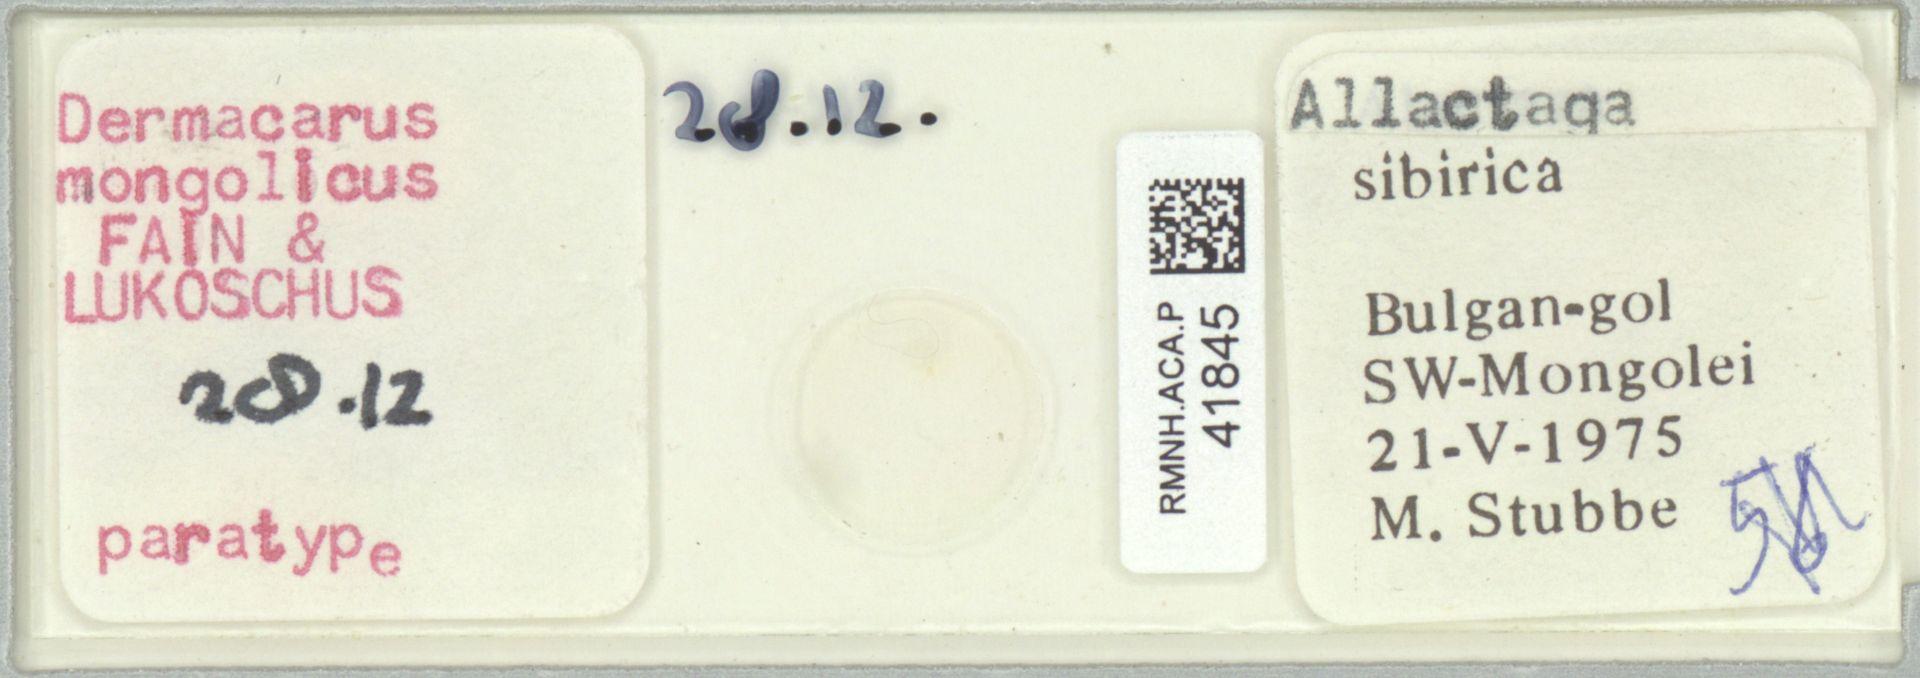 RMNH.ACA.P.41845   Dermacarus mongolicus Fain & Lukoschus